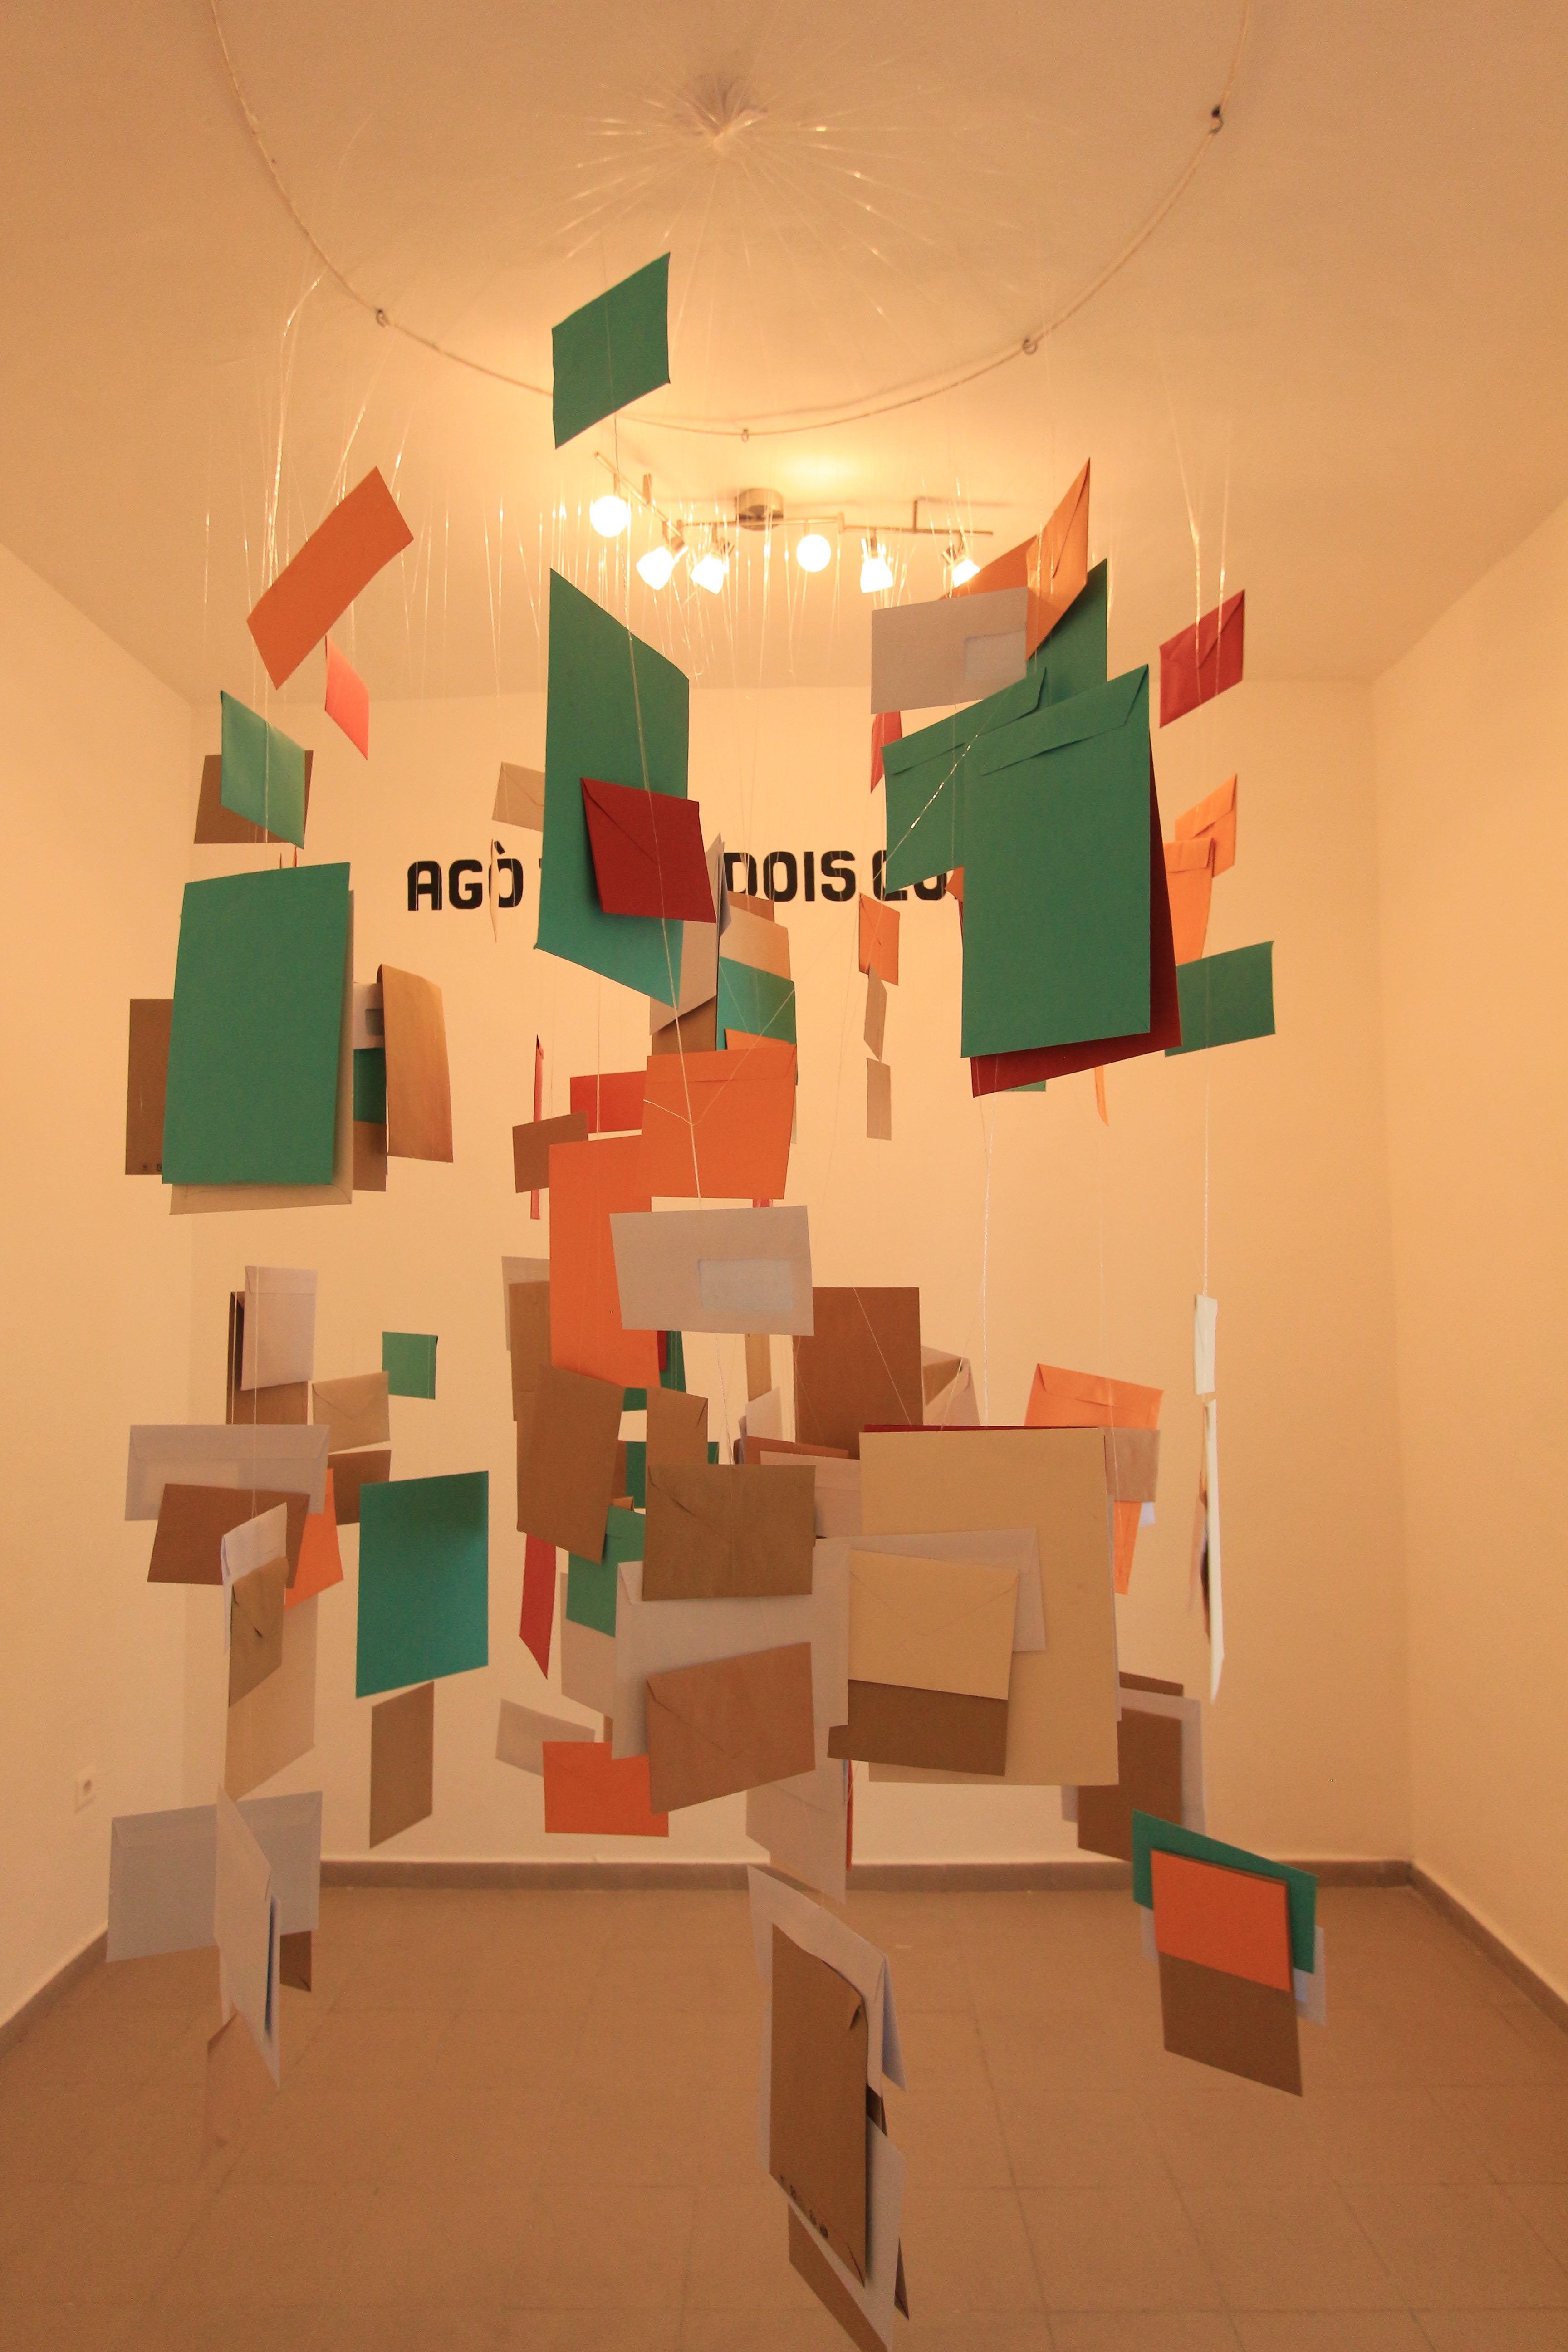 Doto Kuassi & Orémi, Agò tu me dois combien ?, Installation, 2019